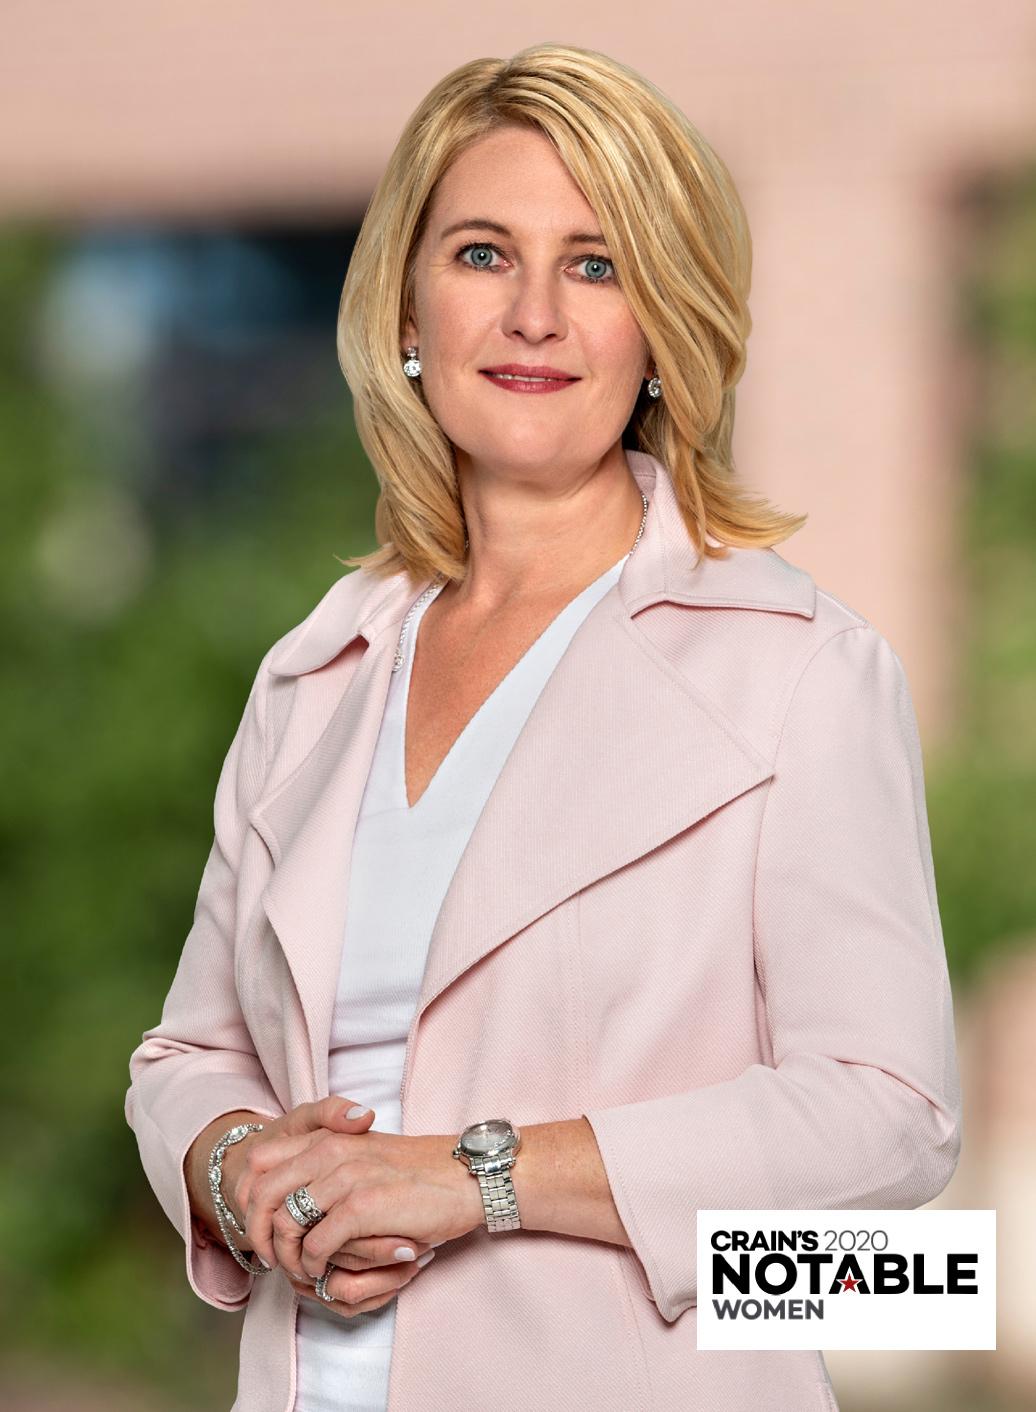 outdoor headshot of female executive